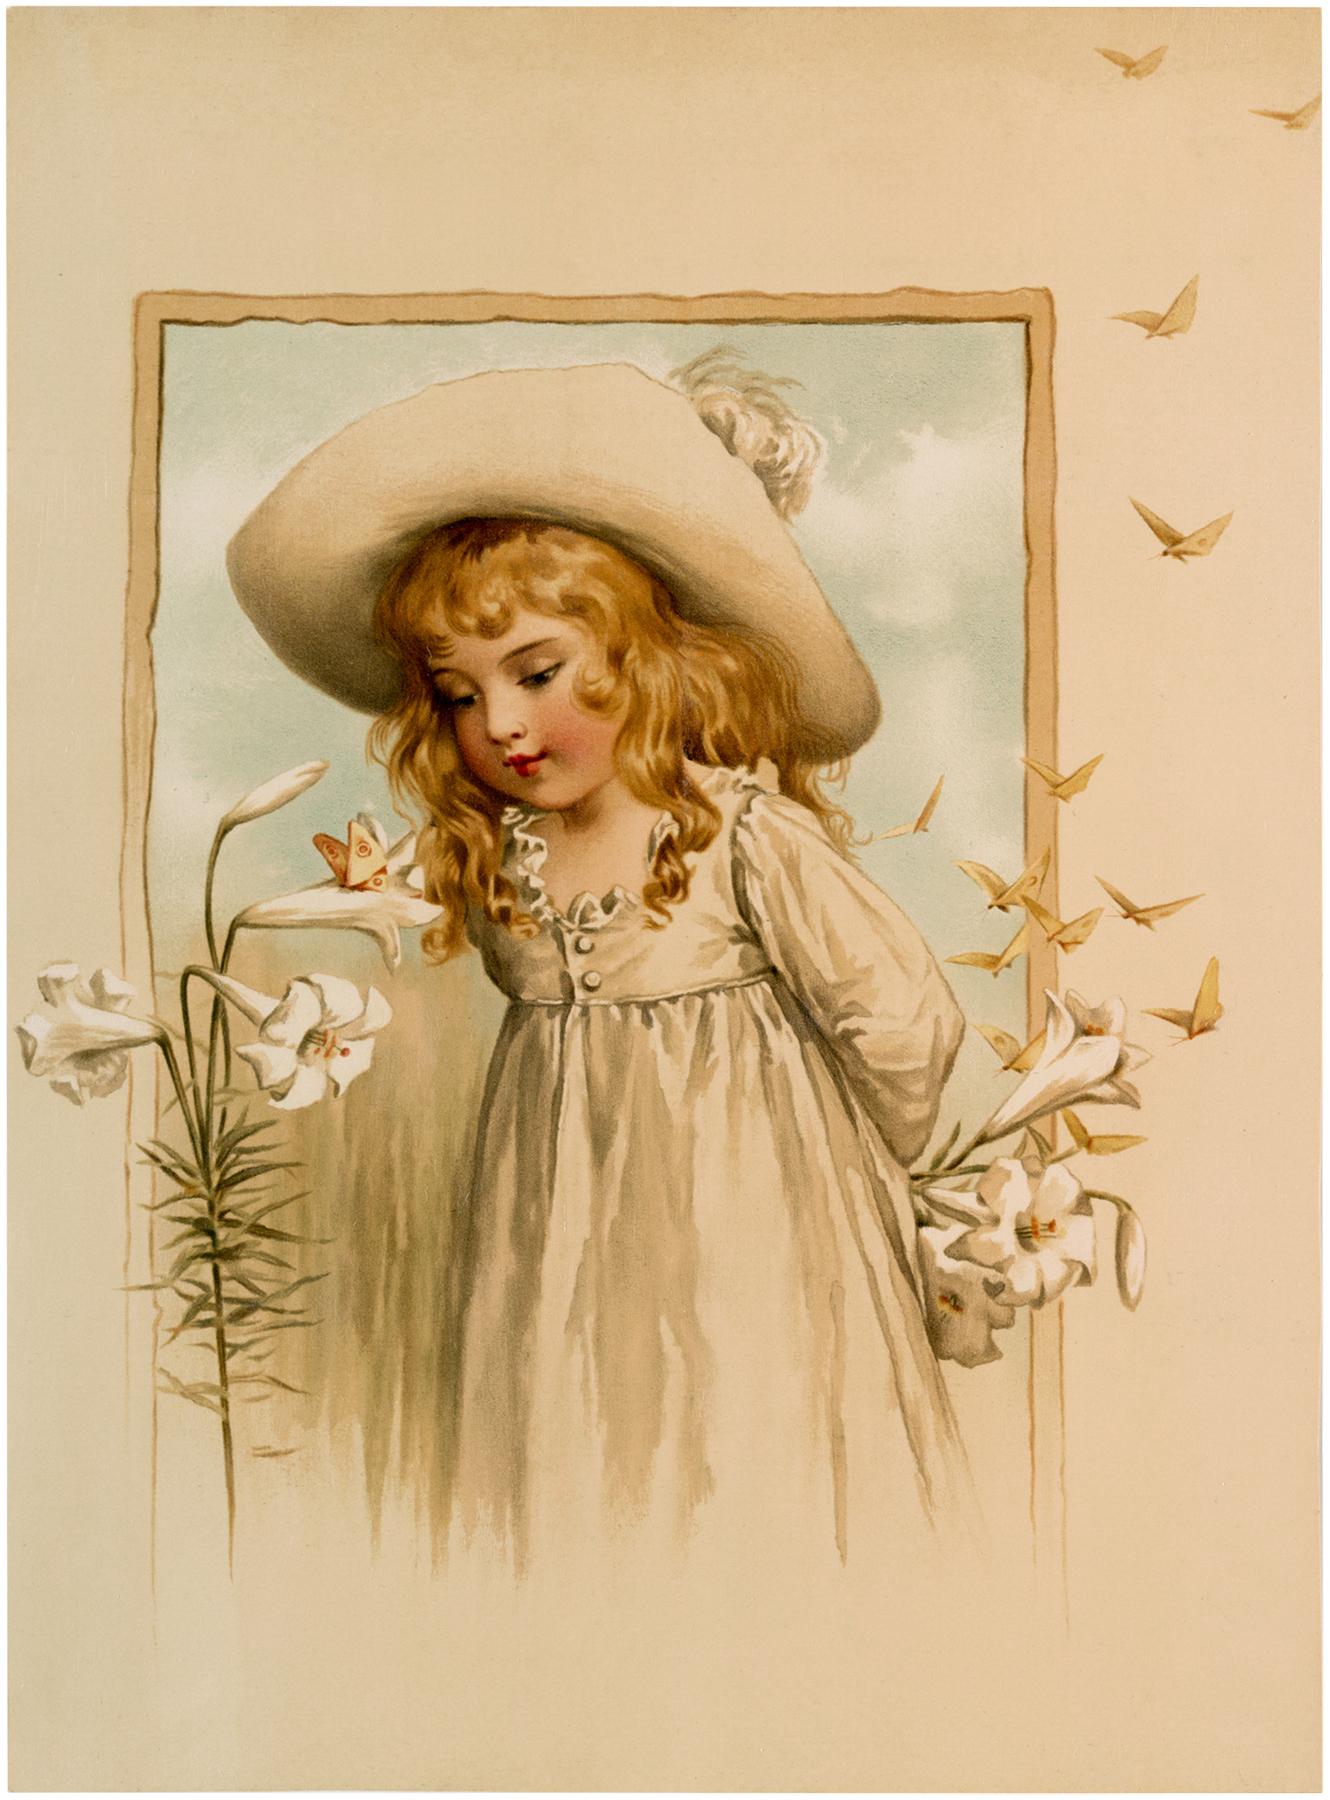 Gorgeous Little Girl Image